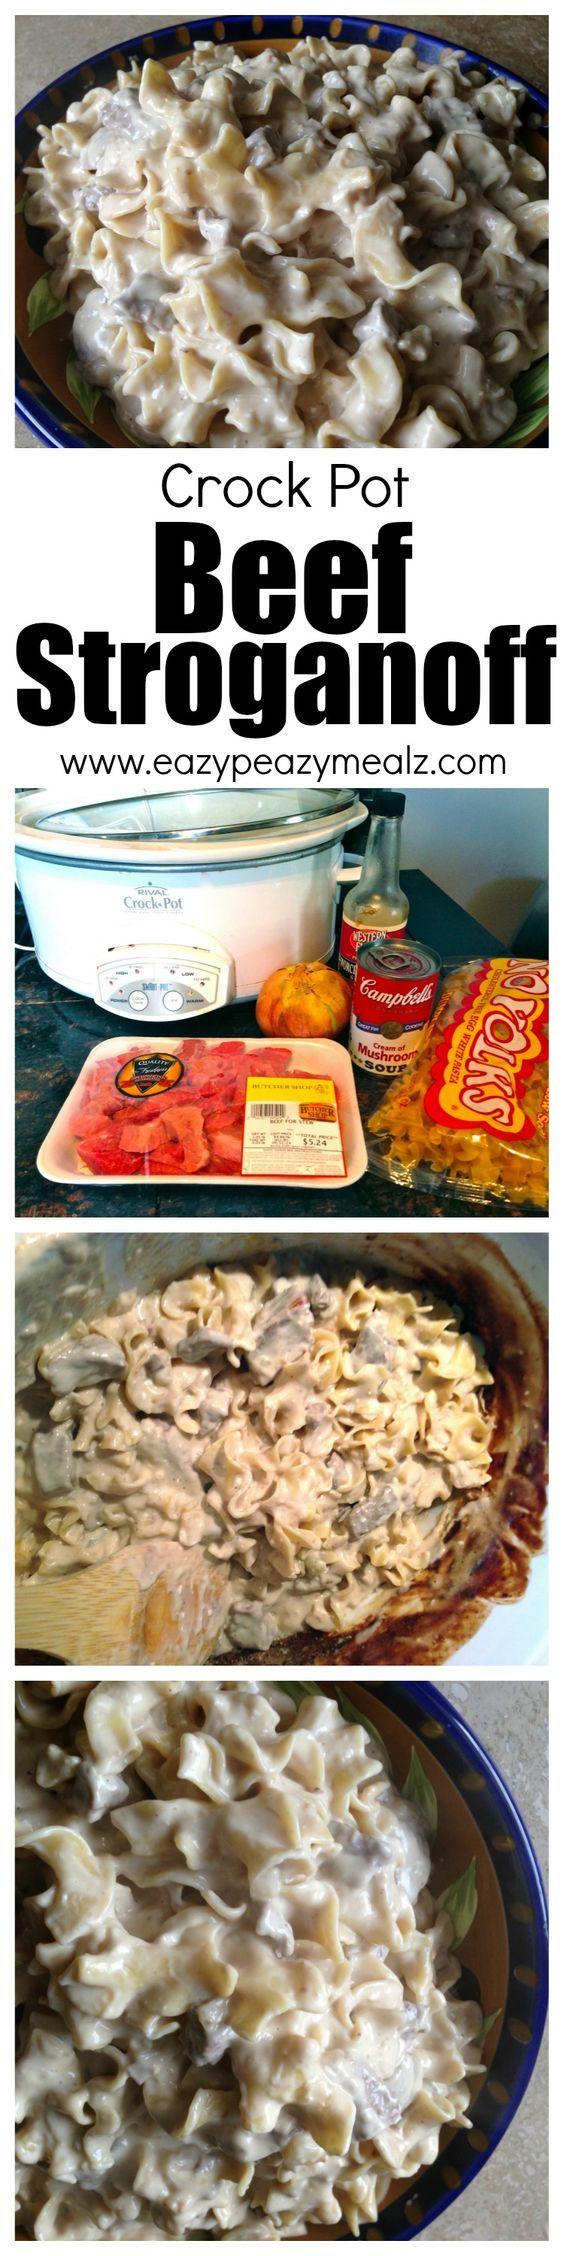 Crock Pot Beef Stroganoff Recipe plus 49 of the most pinned crock pot recipes